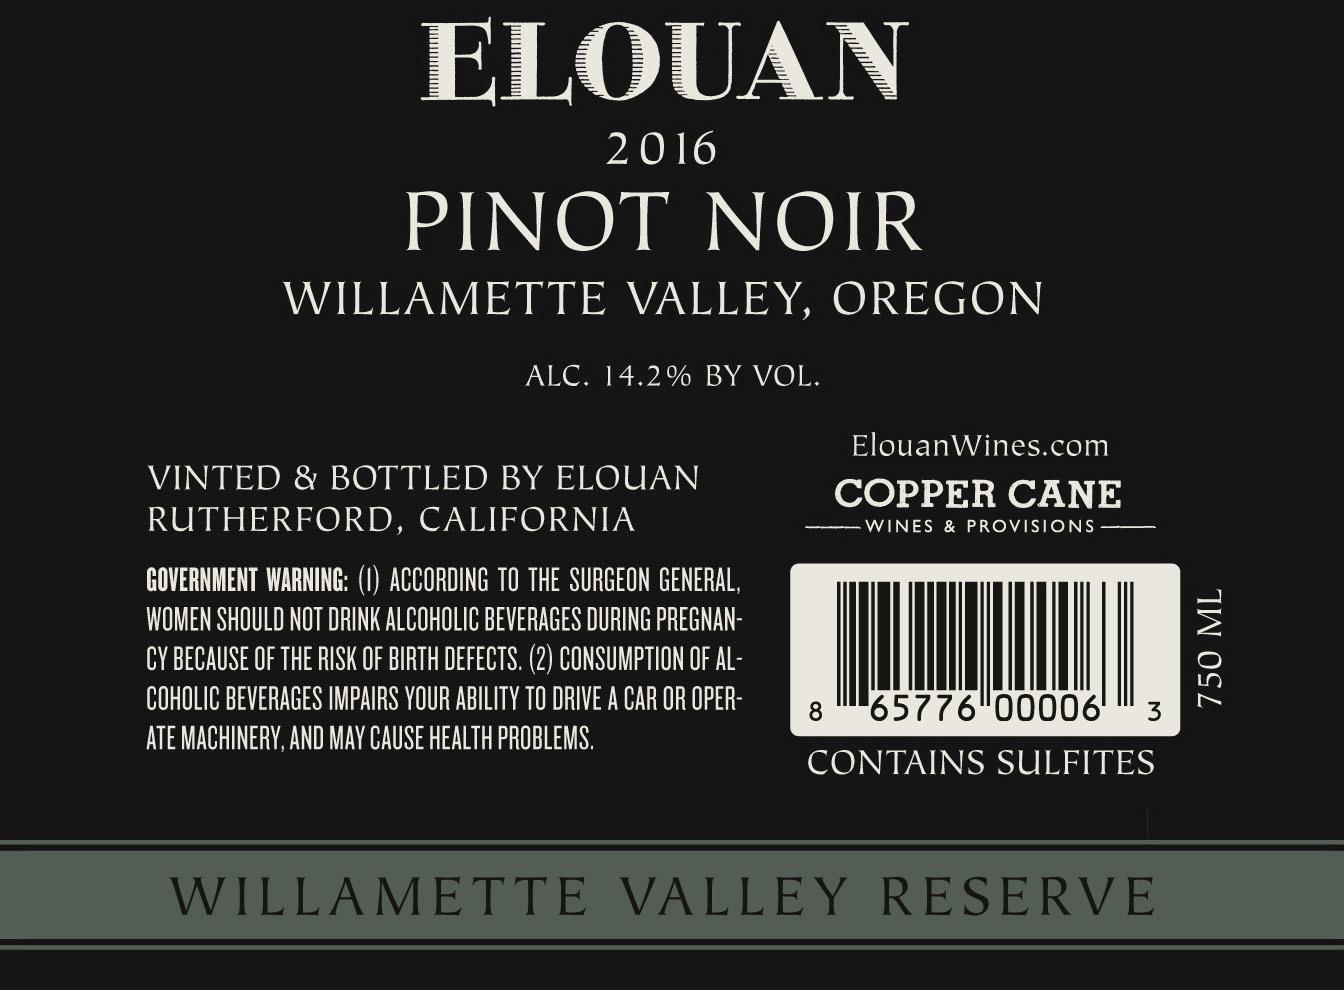 75c7218662 elouan-pinot-noir-oregon-labels-back